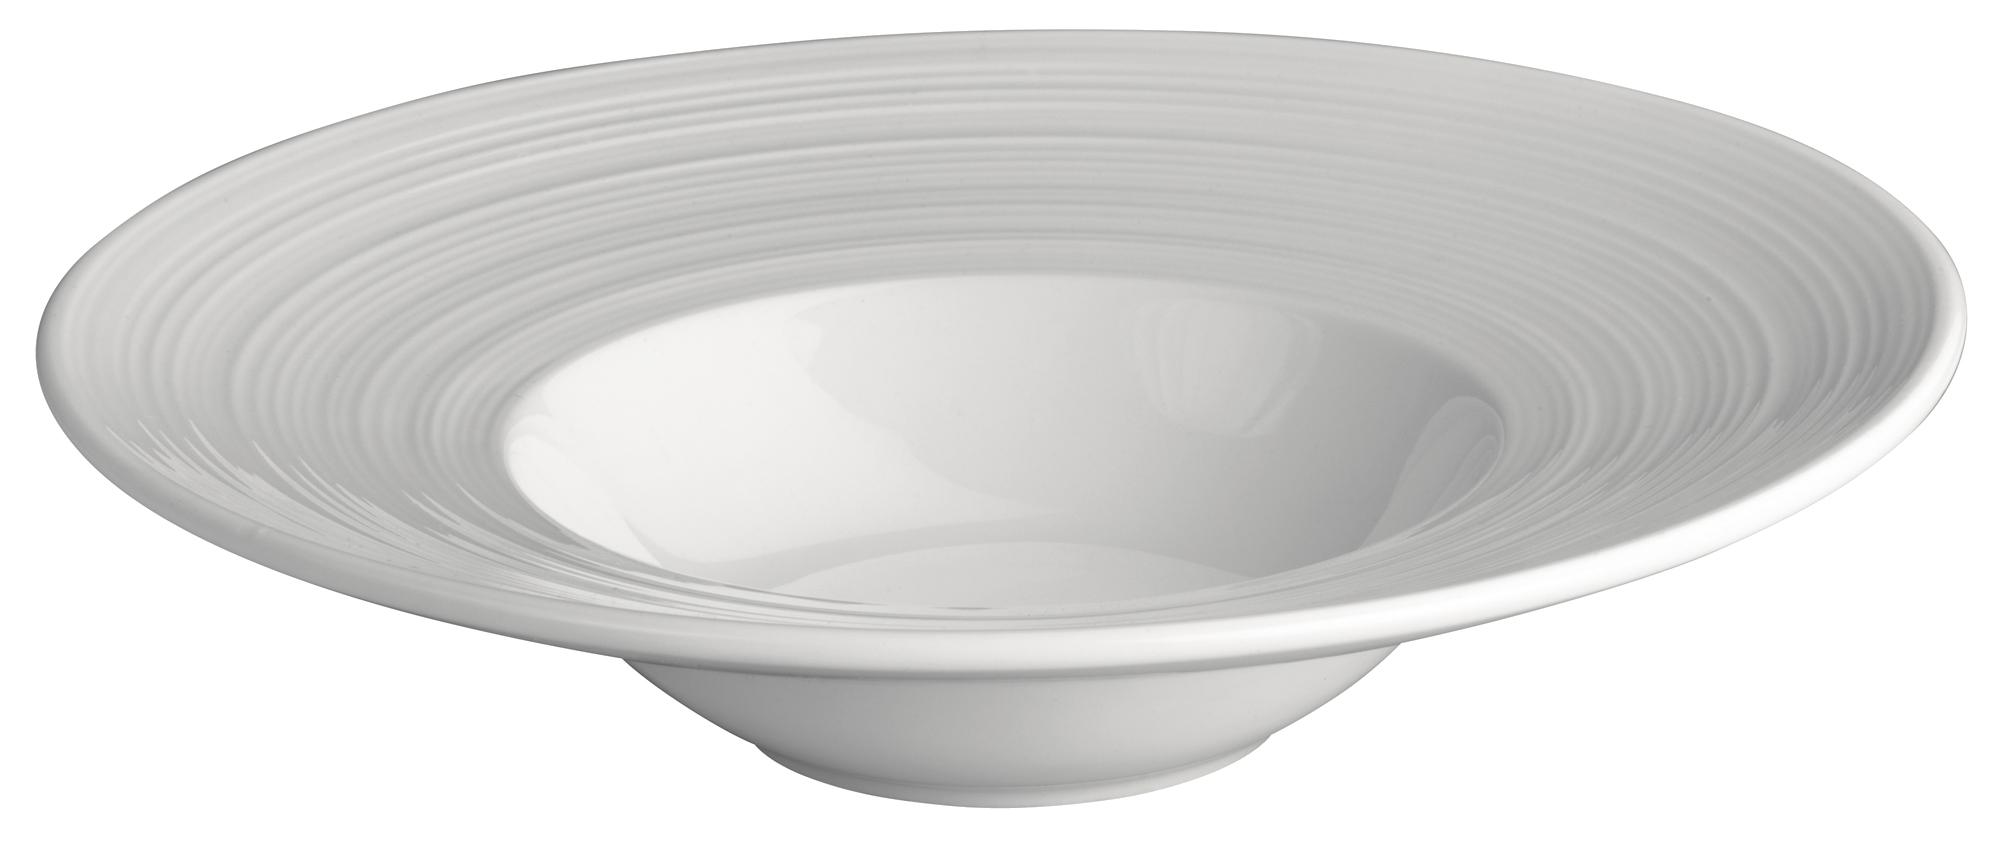 Winco WDP022-104 china, bowl,  9 - 16 oz